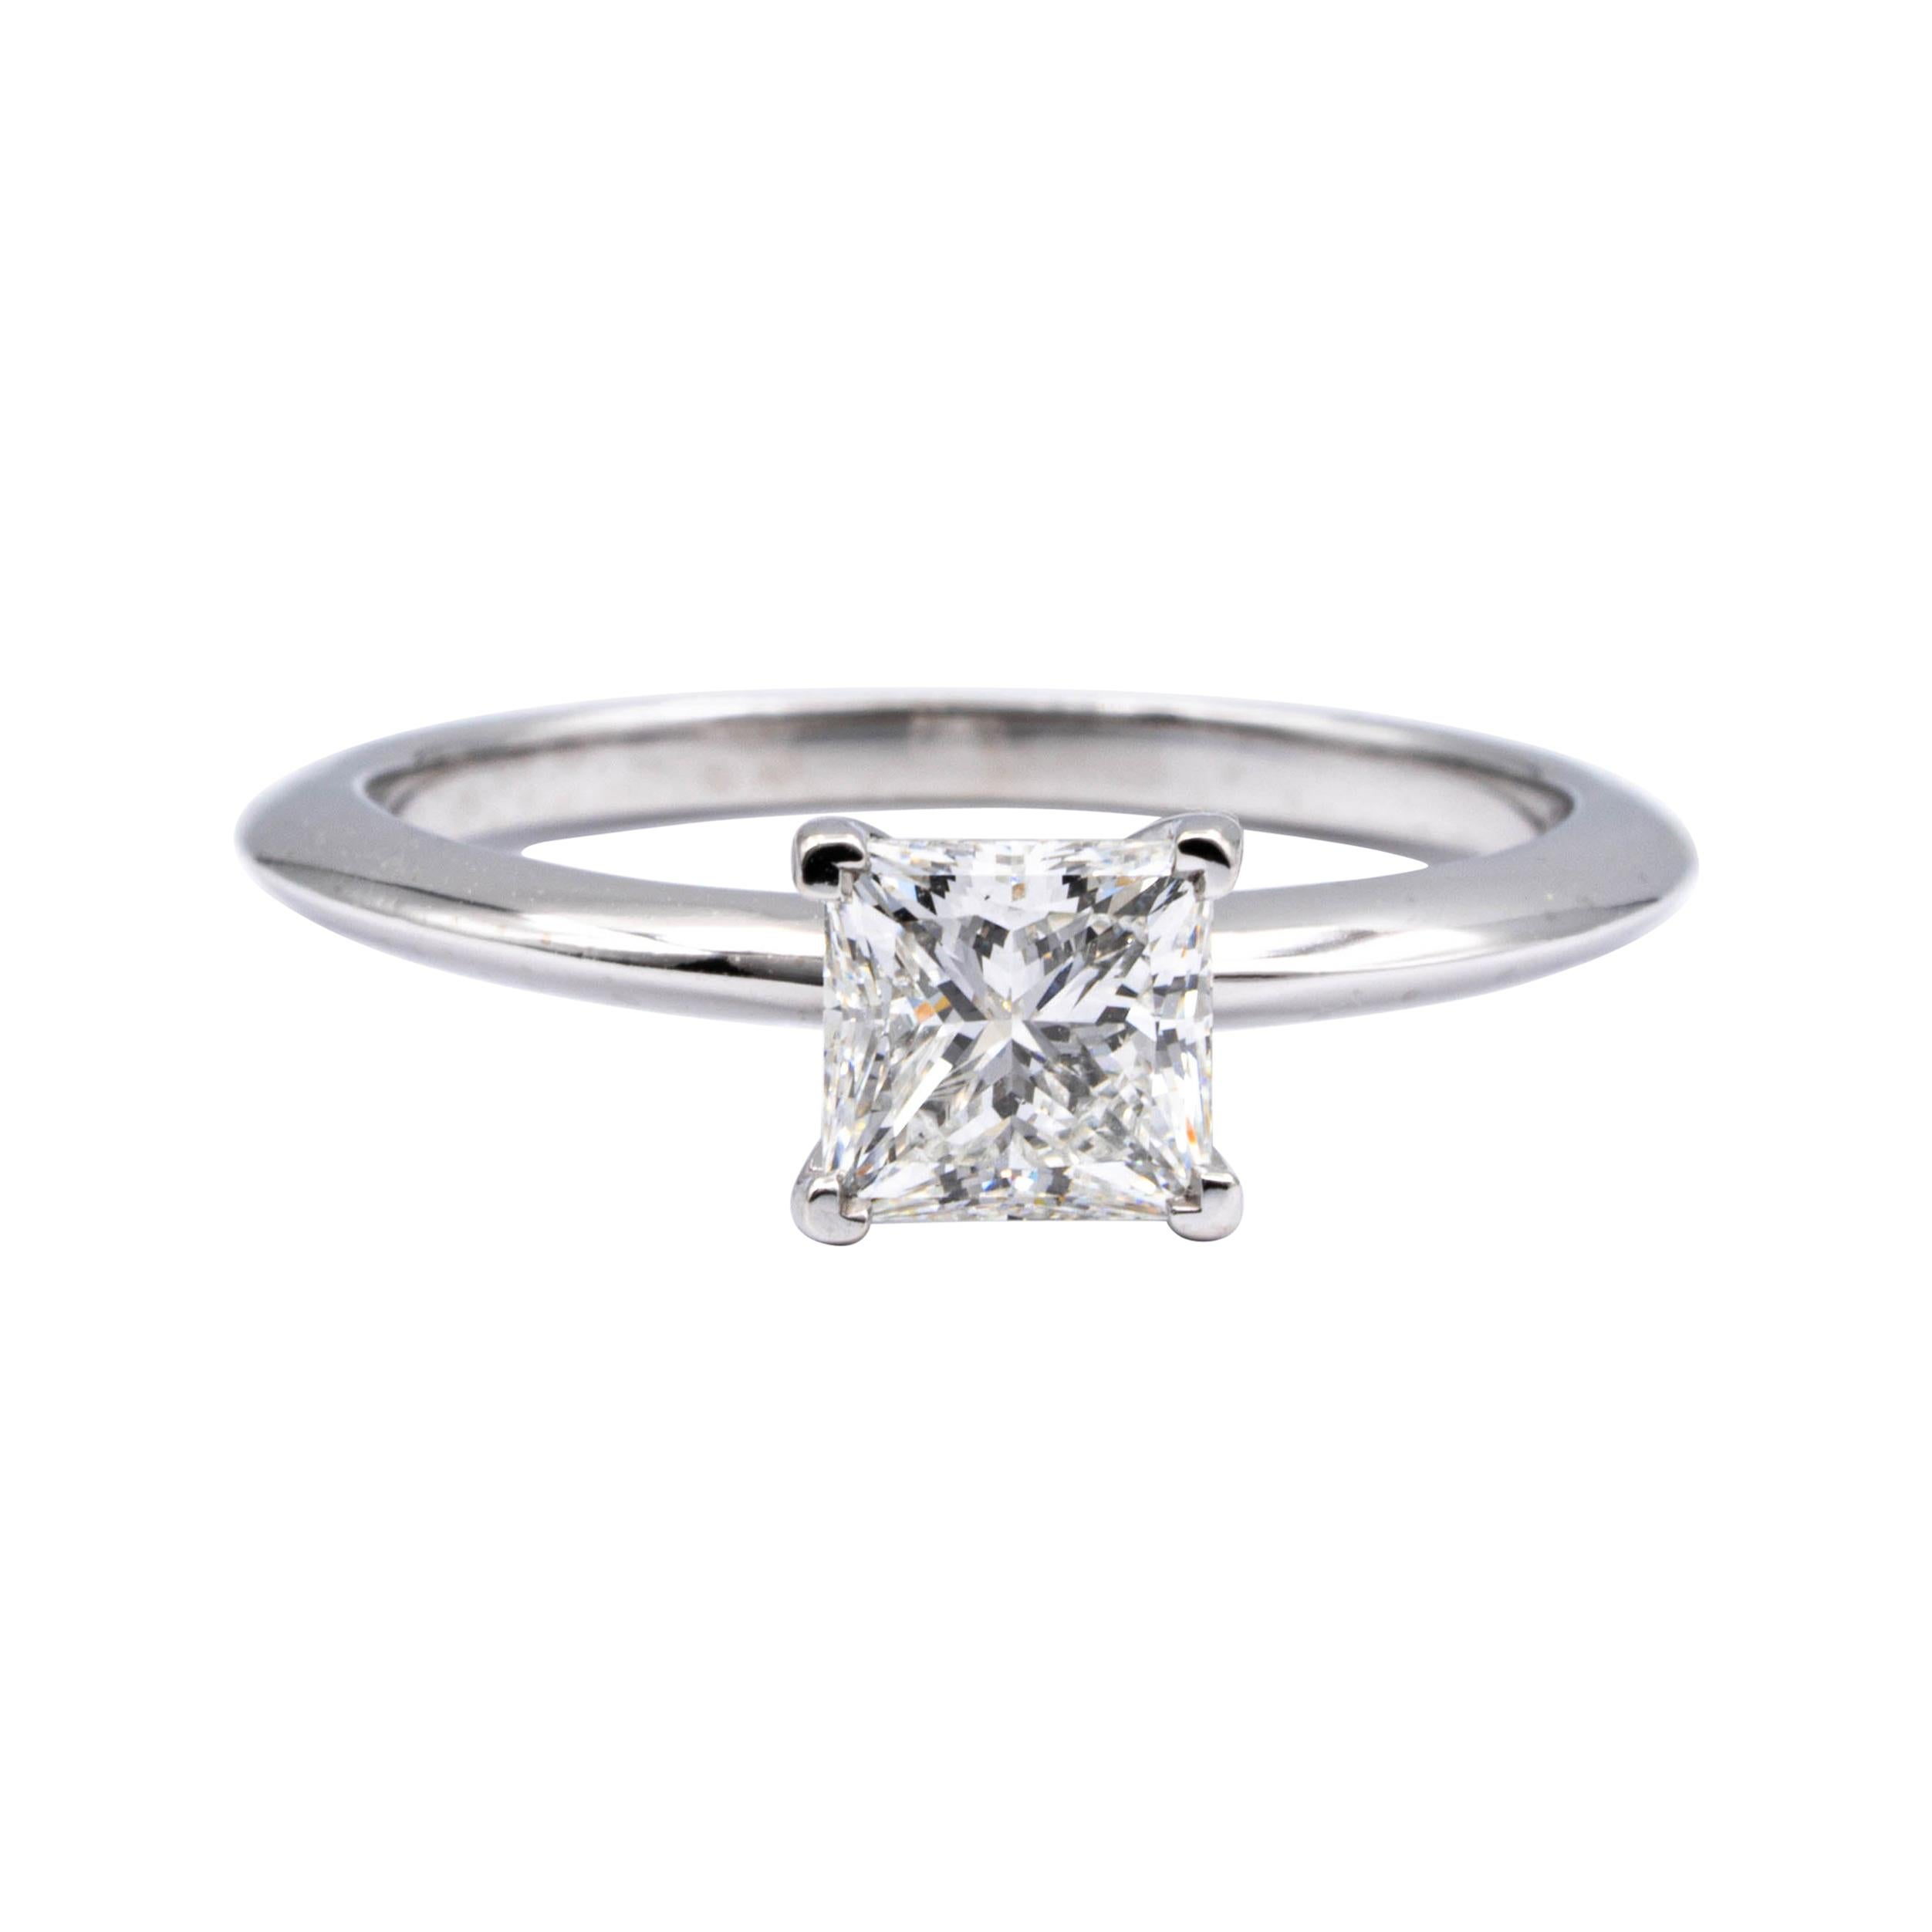 Tiffany & Co. Platinum Diamond Engagement Ring .93 Ct Princess Cut Solitaire